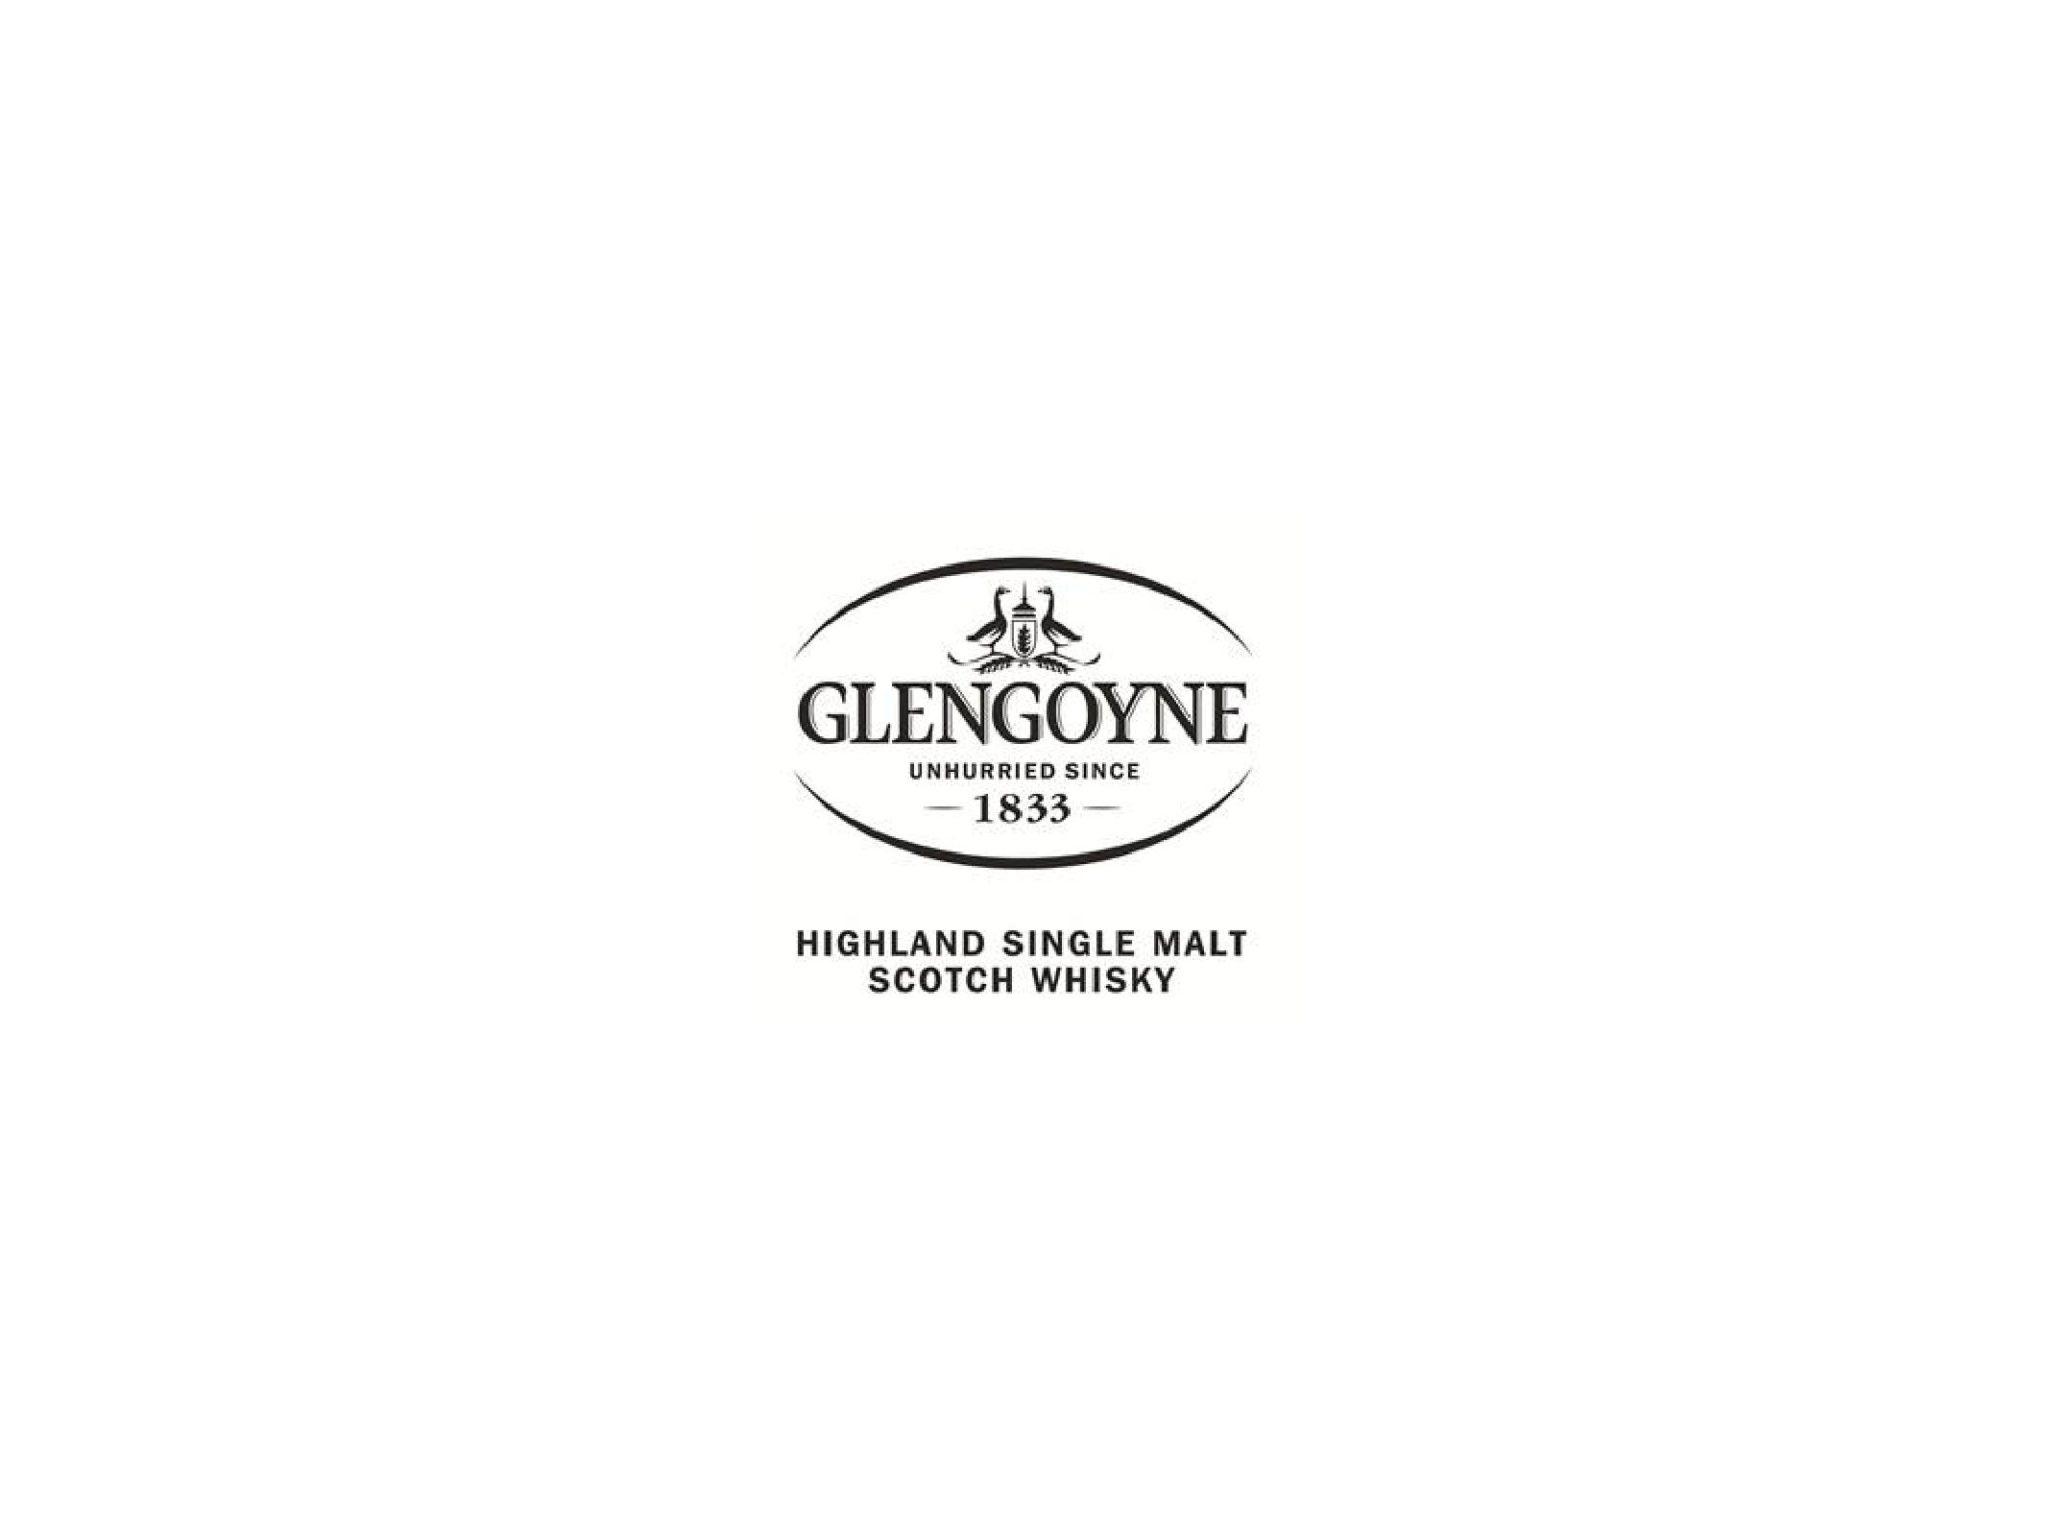 GLENGOYNE-page-001